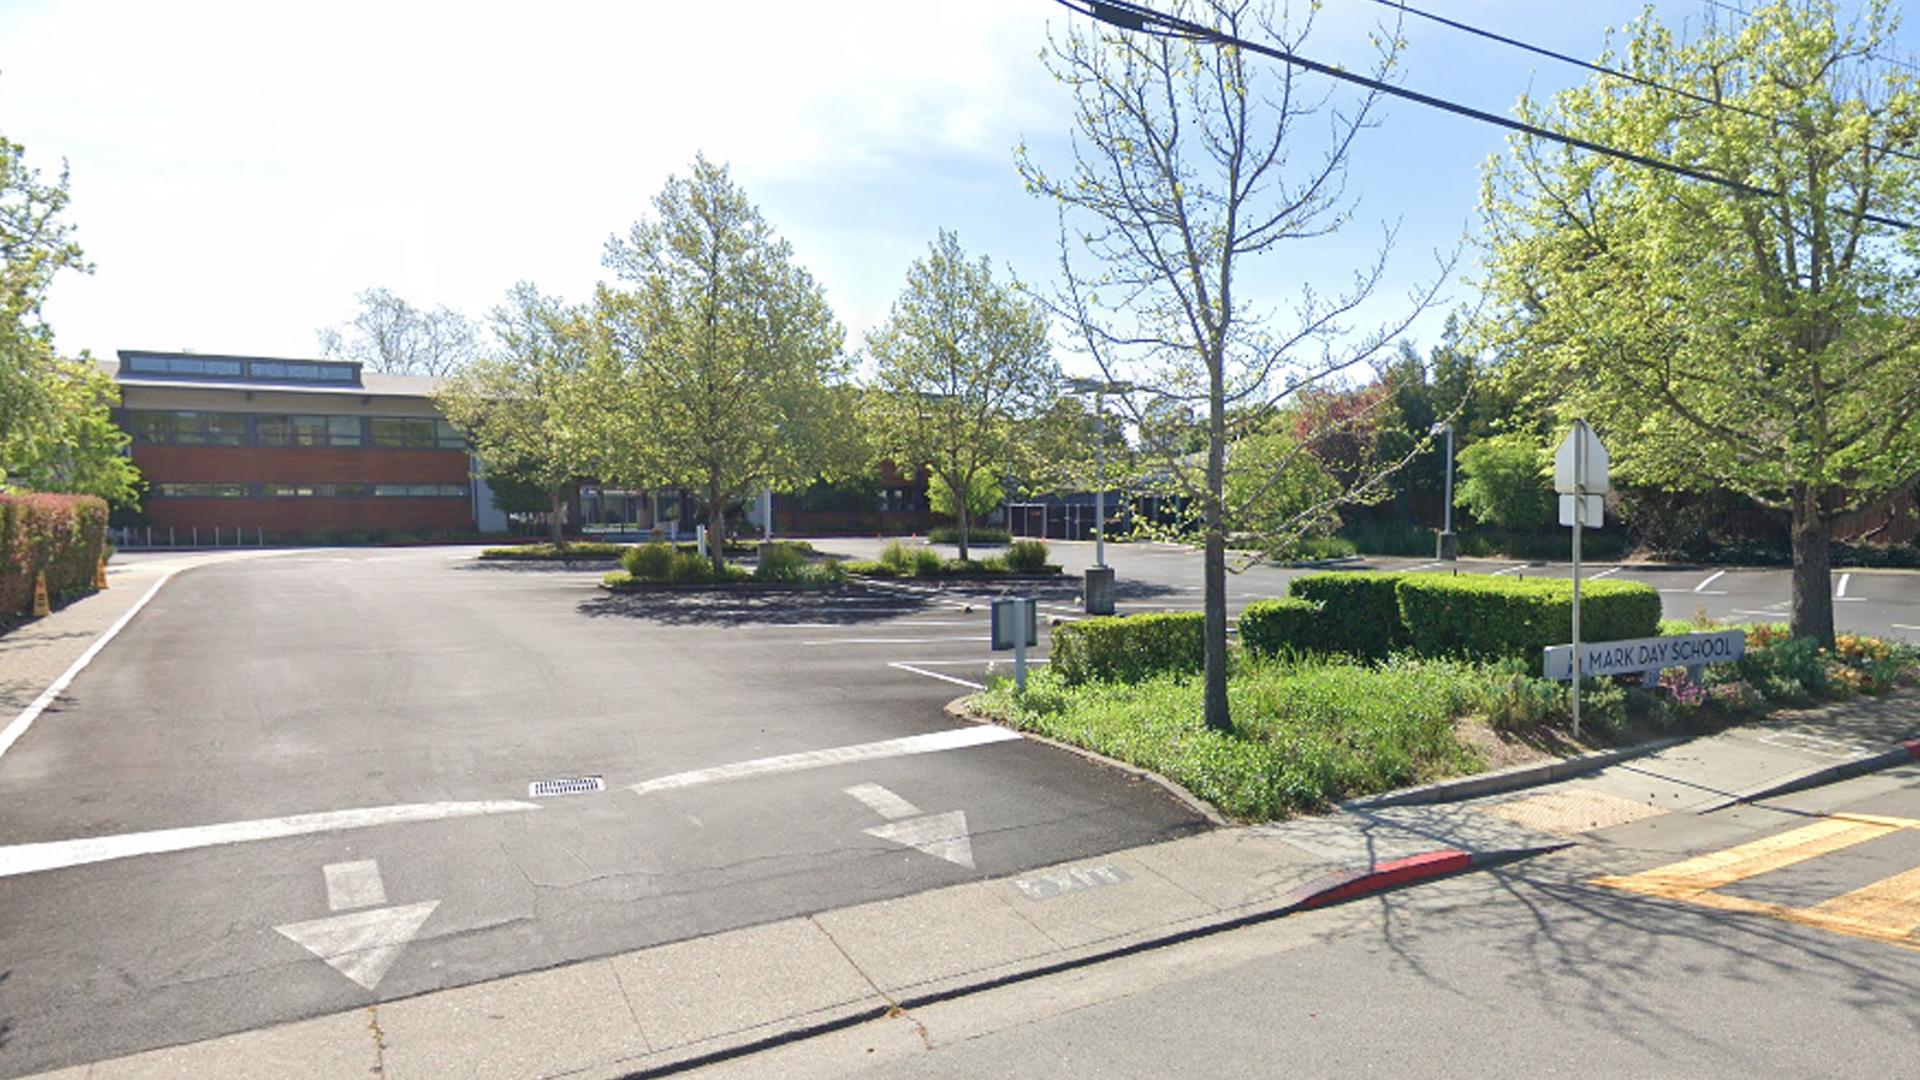 Mark Day School in San Rafael is seen in a Google Maps Street View image.